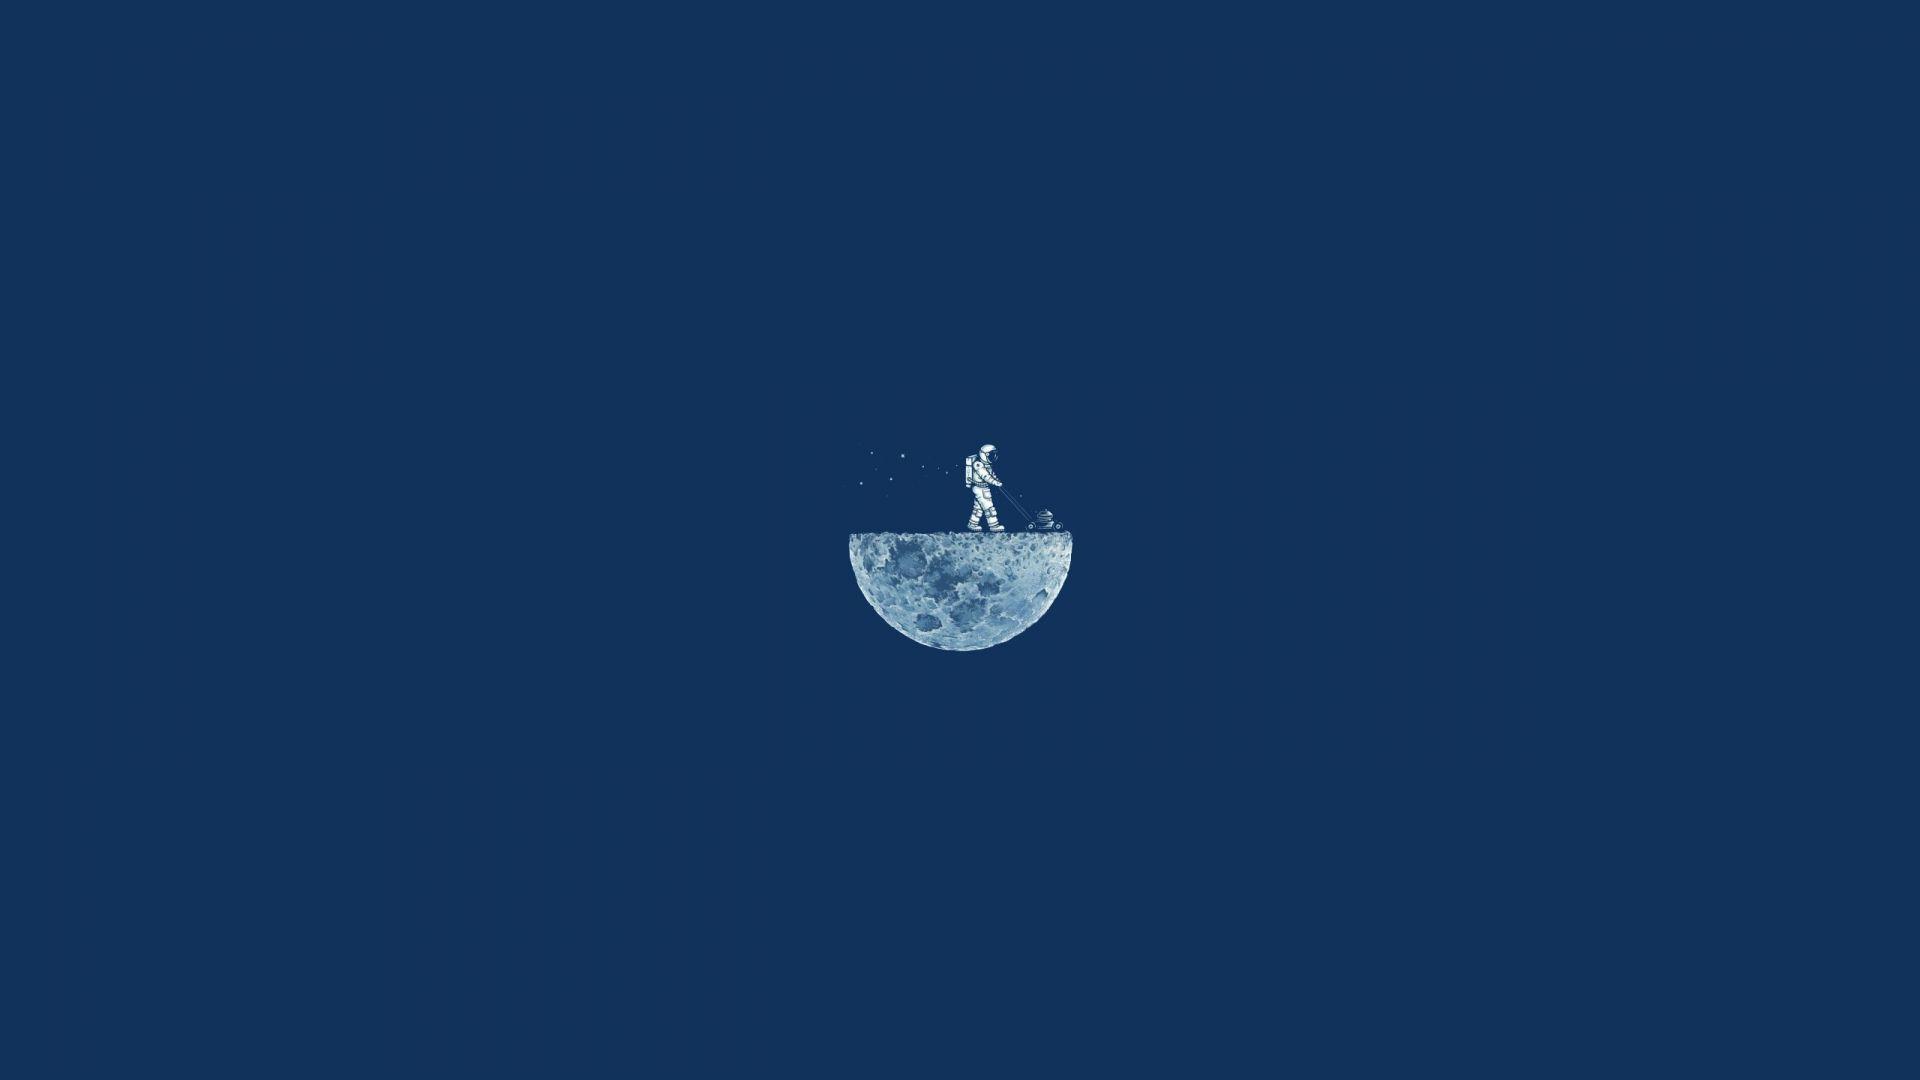 Moon Mow, 4k, HD, moon, minimalism, iphone wallpaper, astronaut, ...